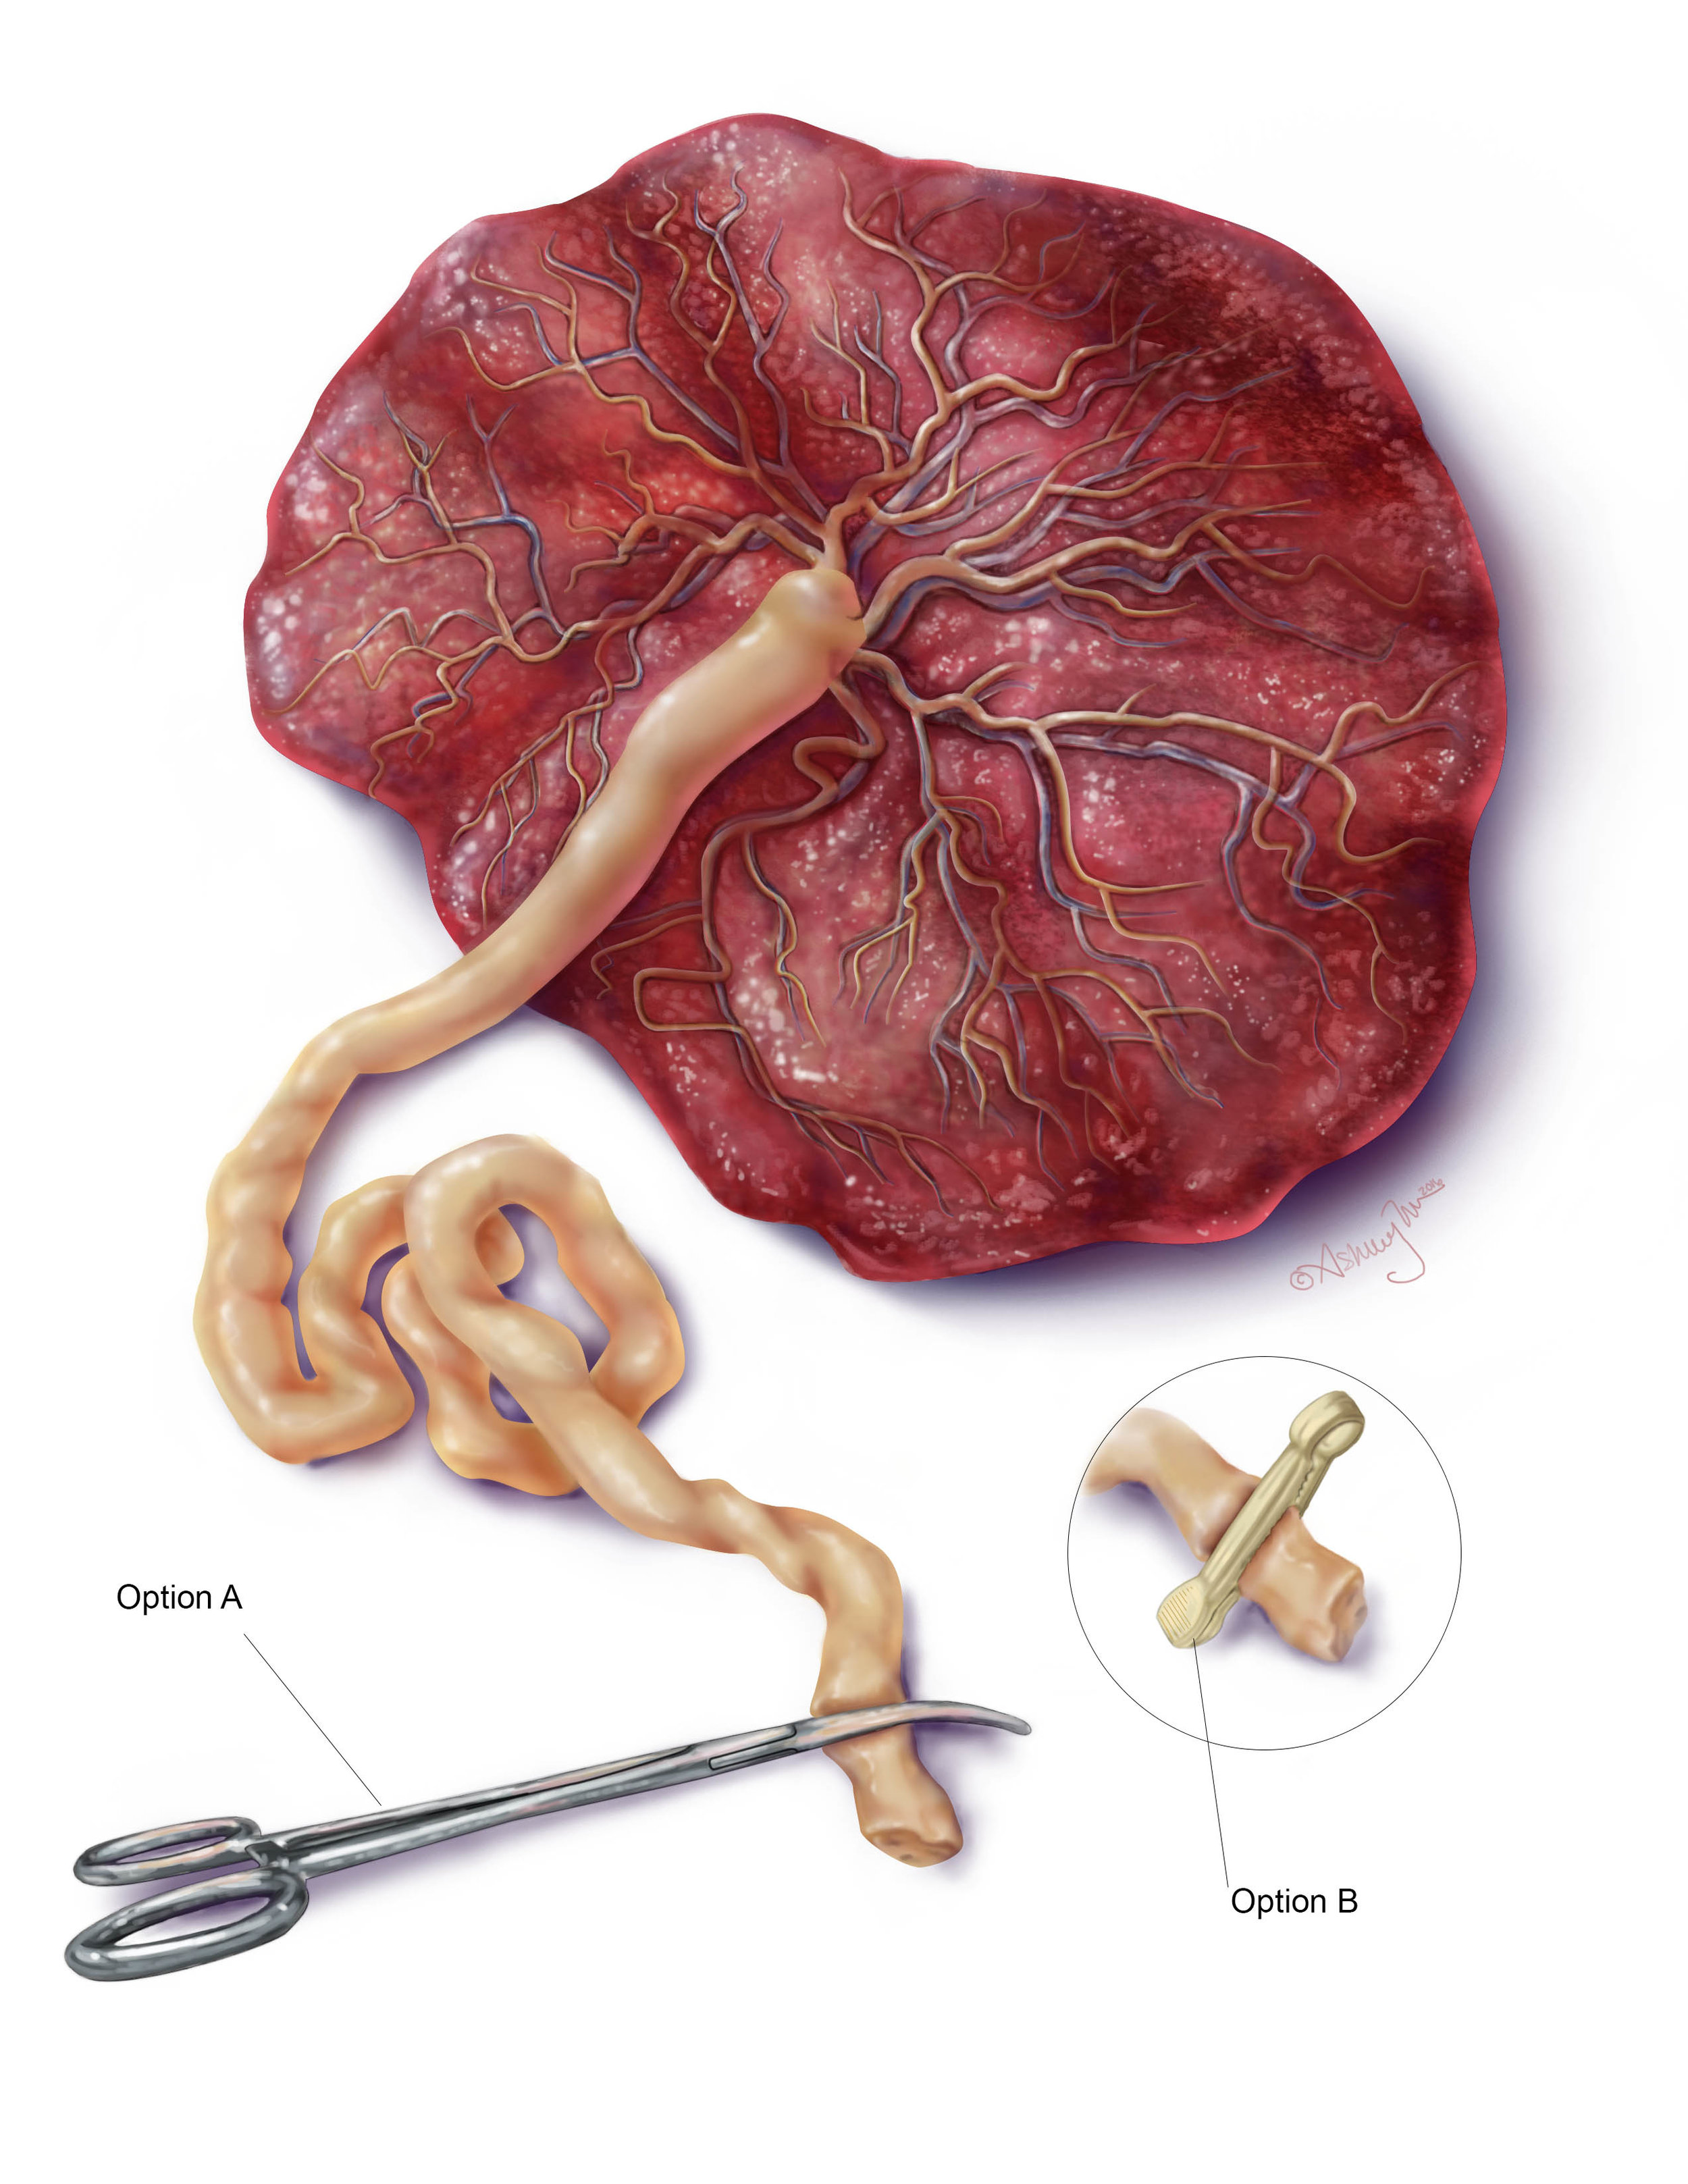 Copy of Placenta